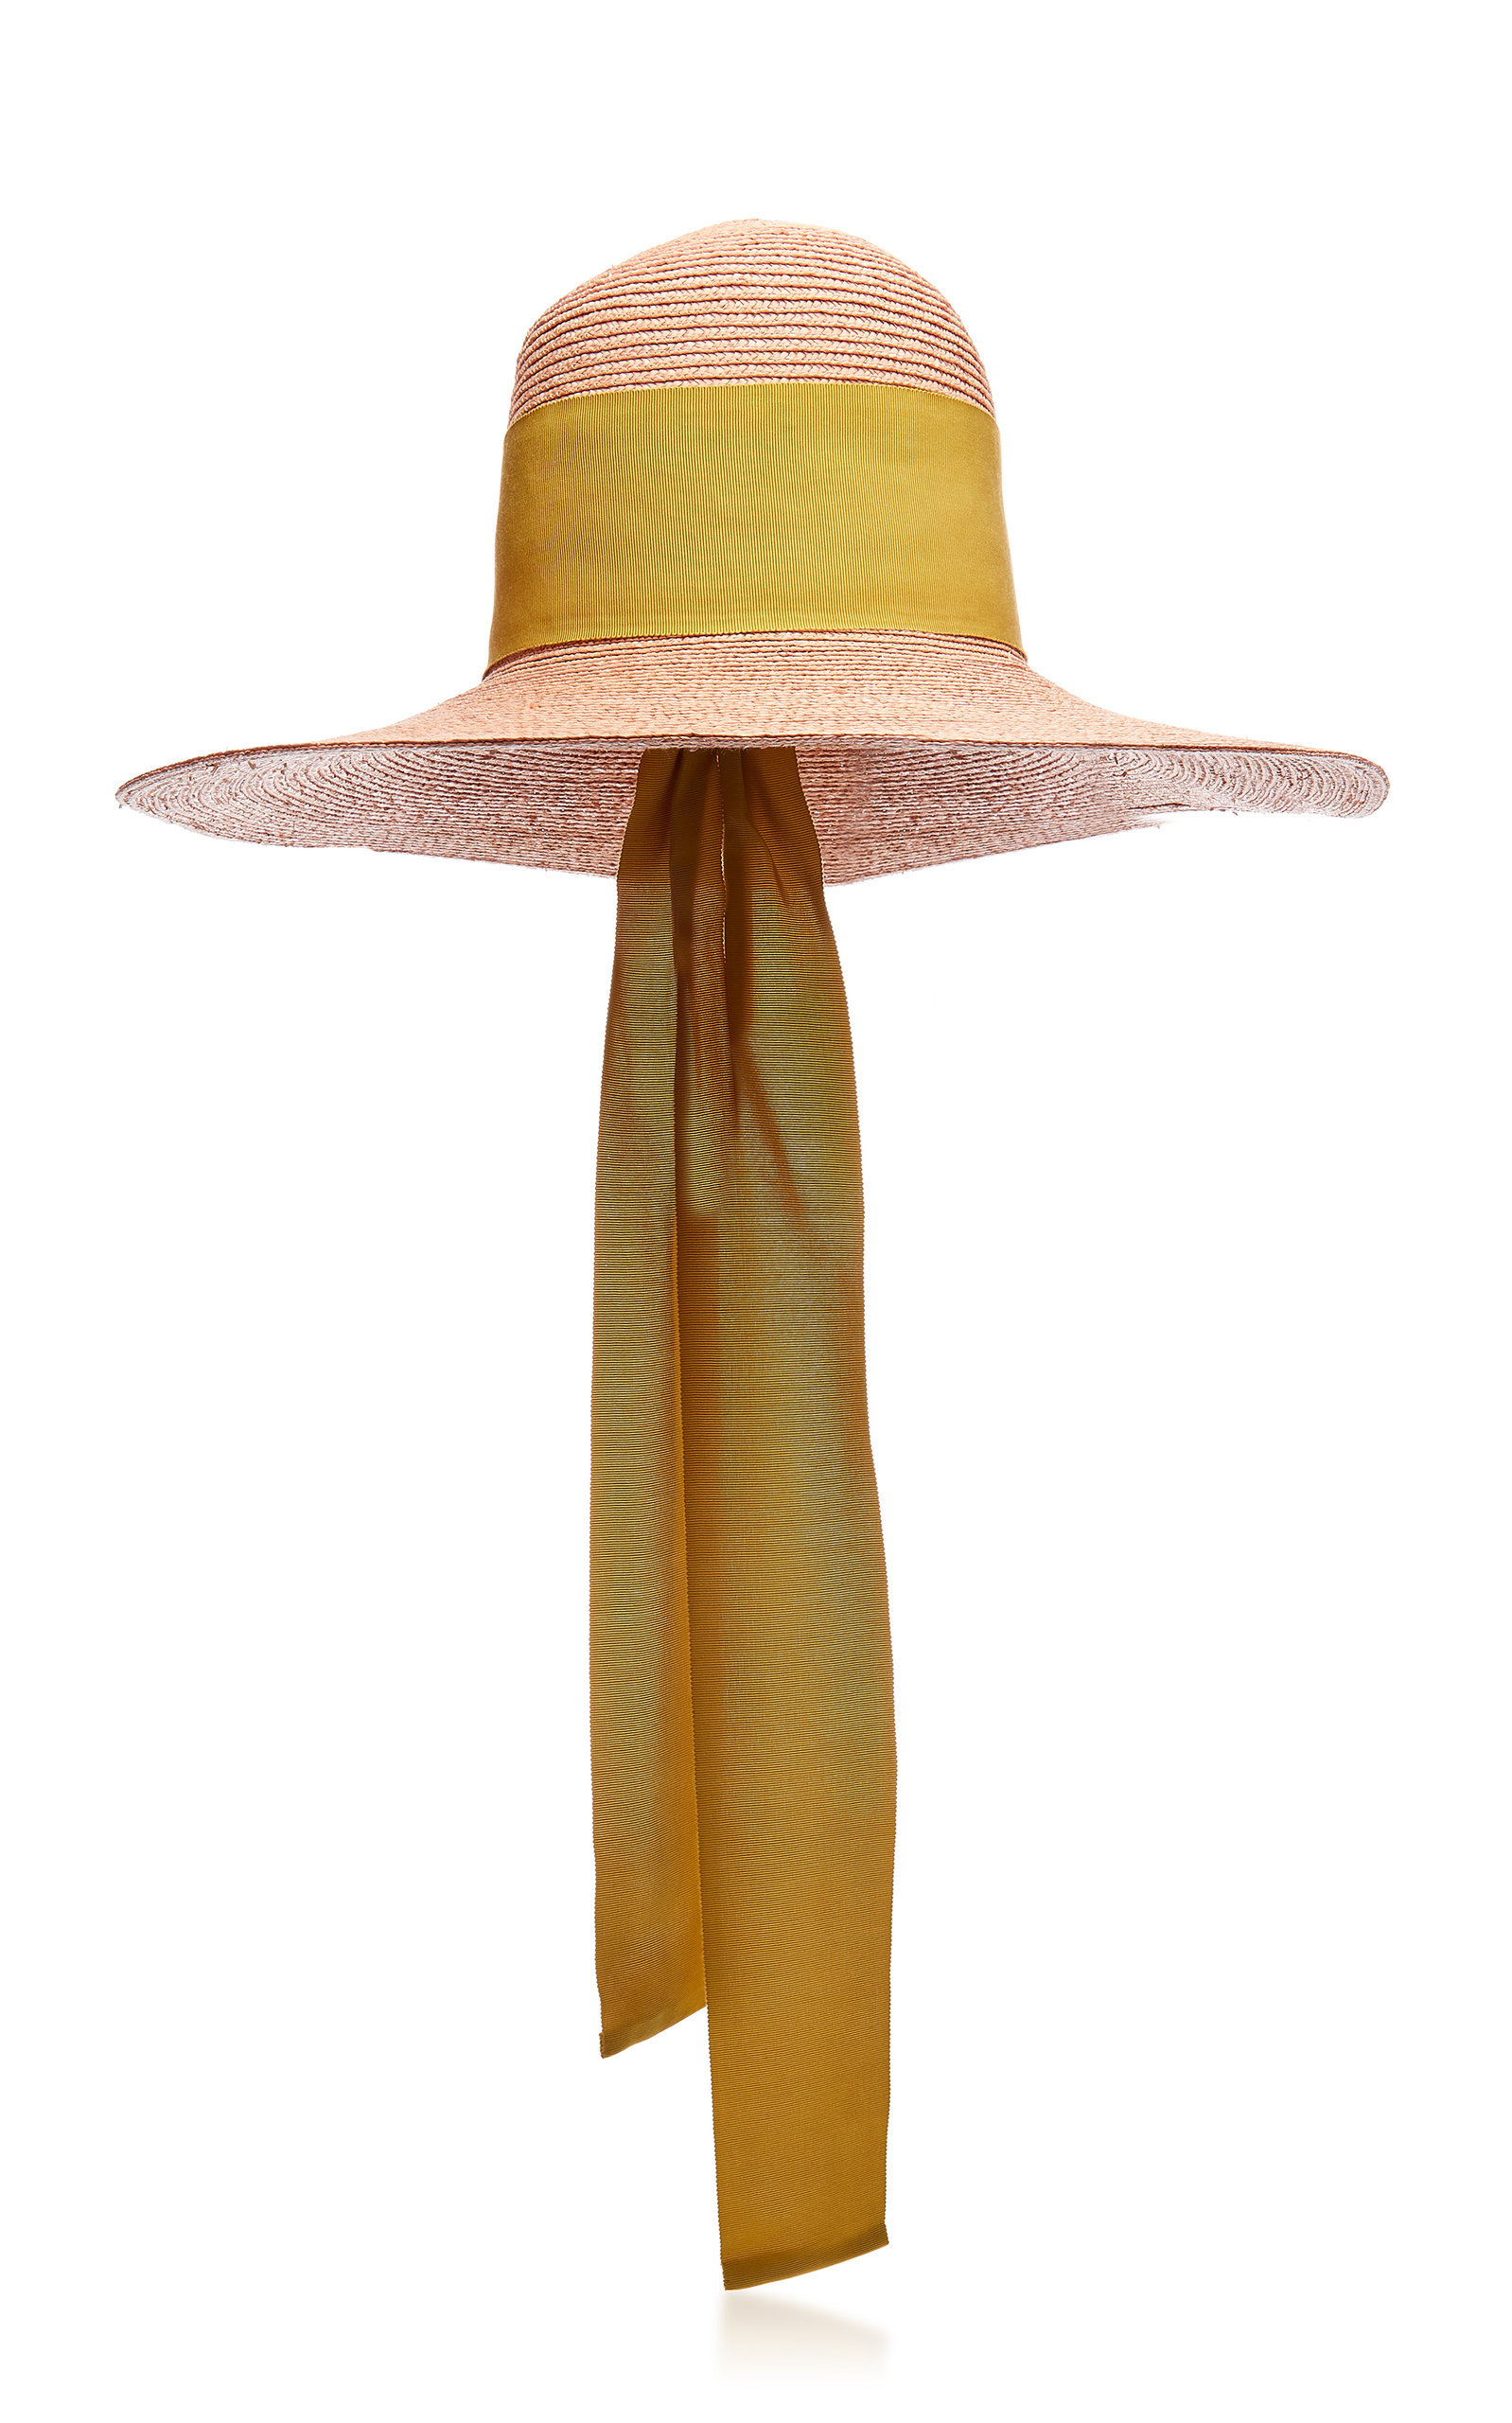 a14e6f5b43909 Shop Yestadt Millinery Naptune Straw Hat In Neutral